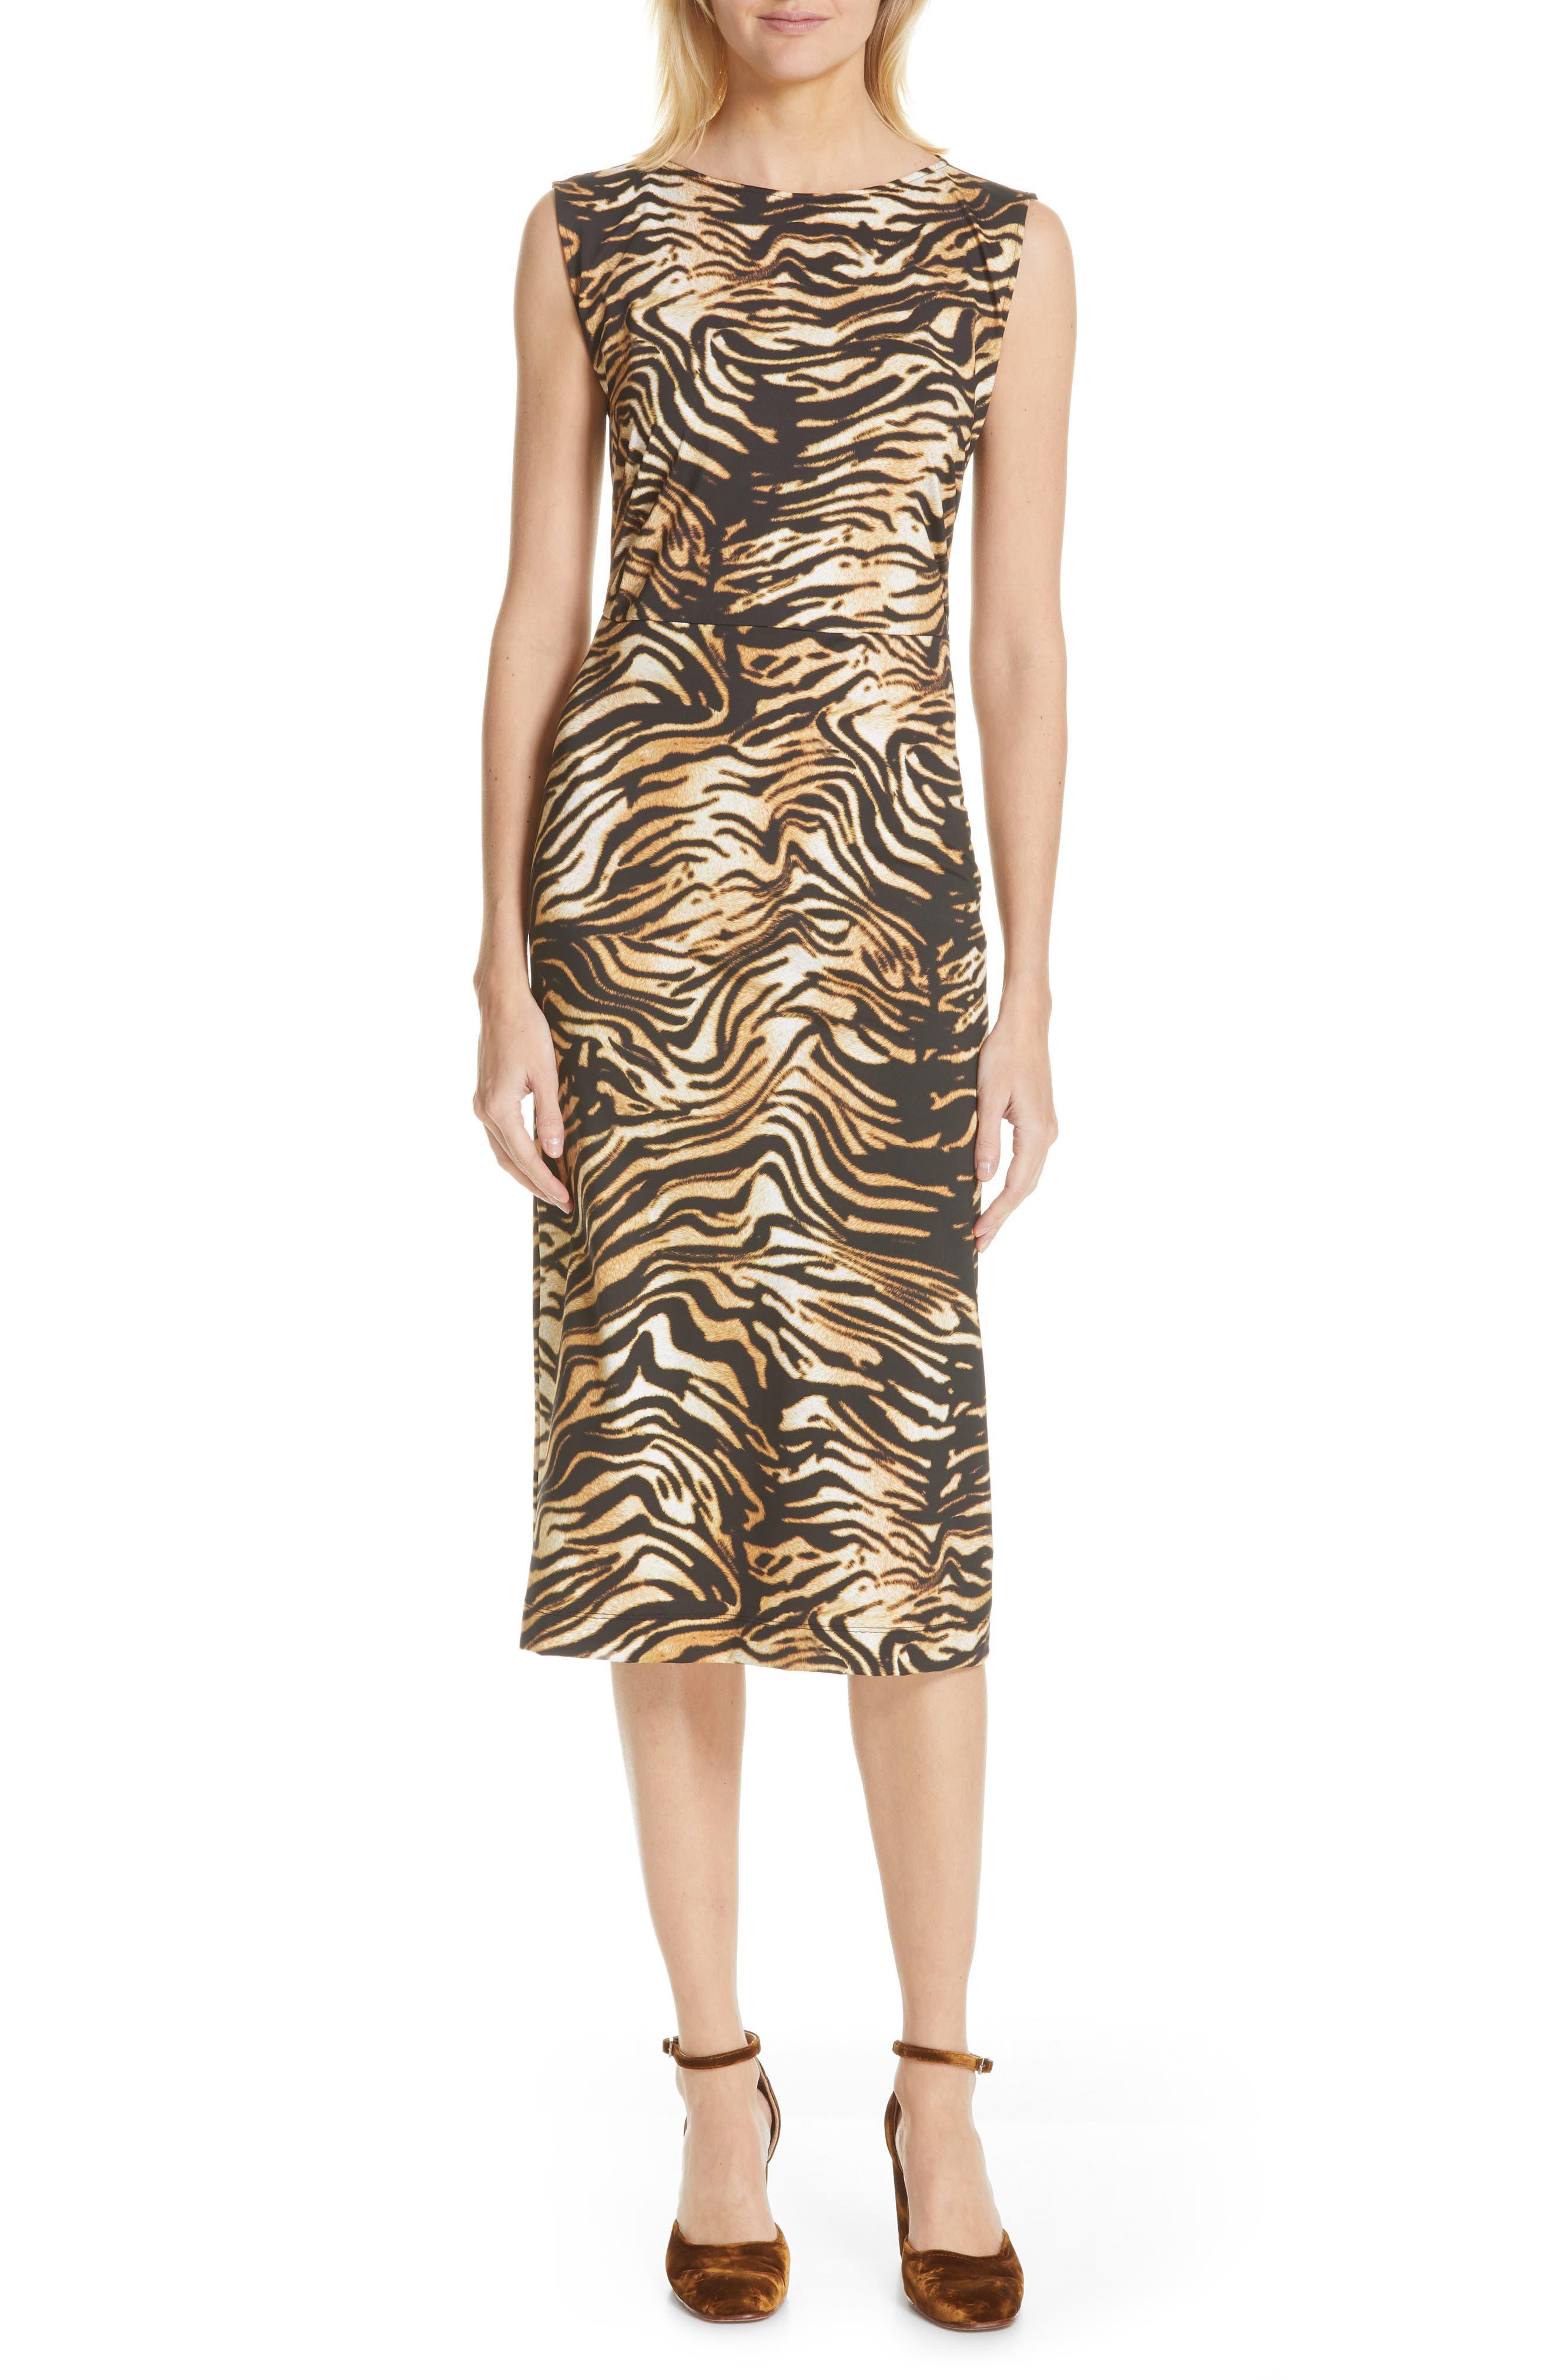 Rachel Comey Medina Tiger Print Sheath Dress, Brown